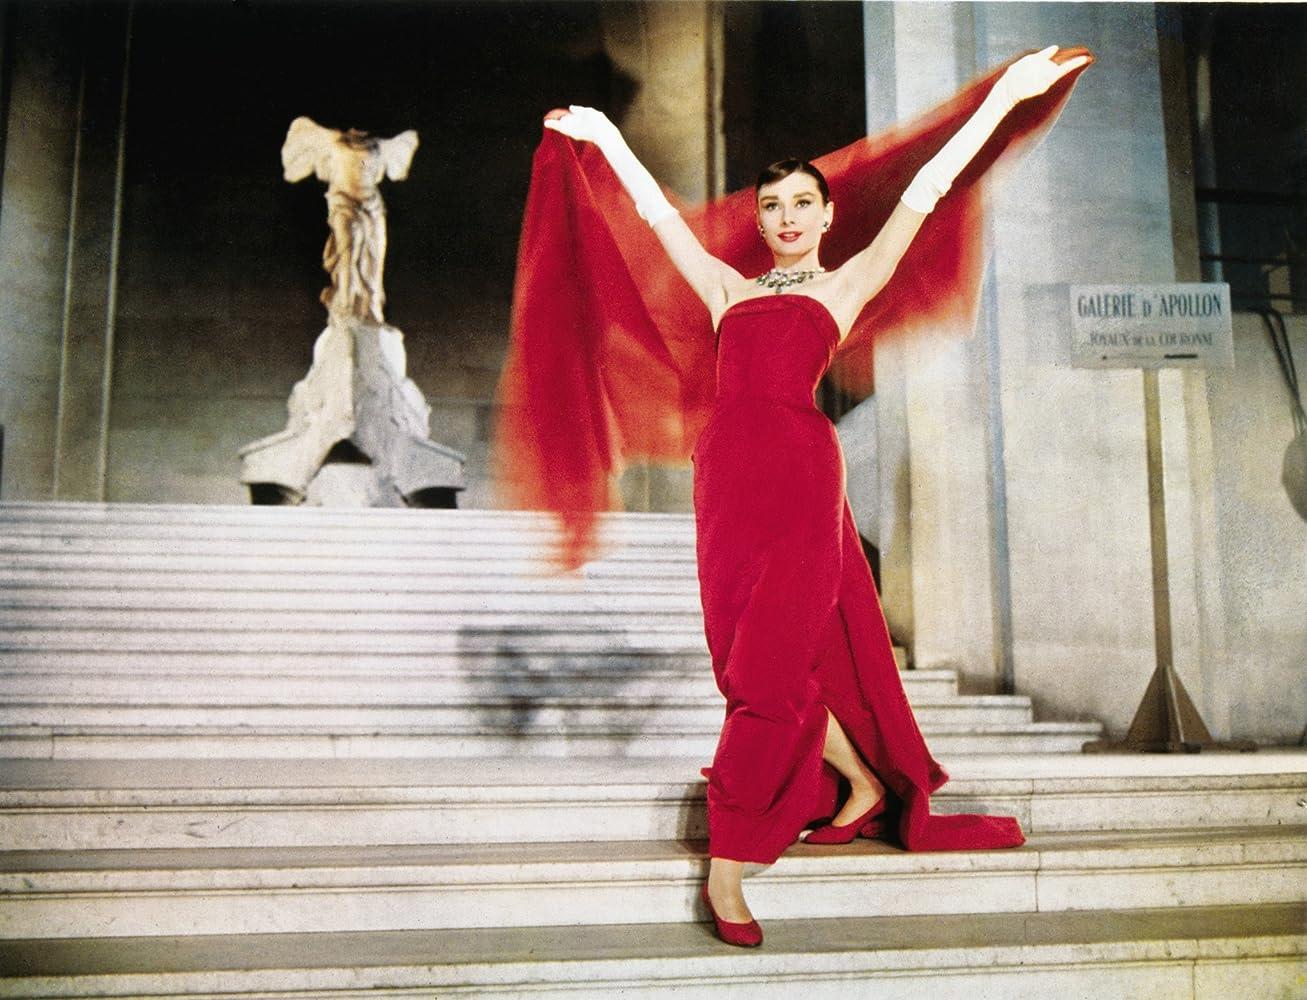 Audrey Hepburn in Funny Face (1957)